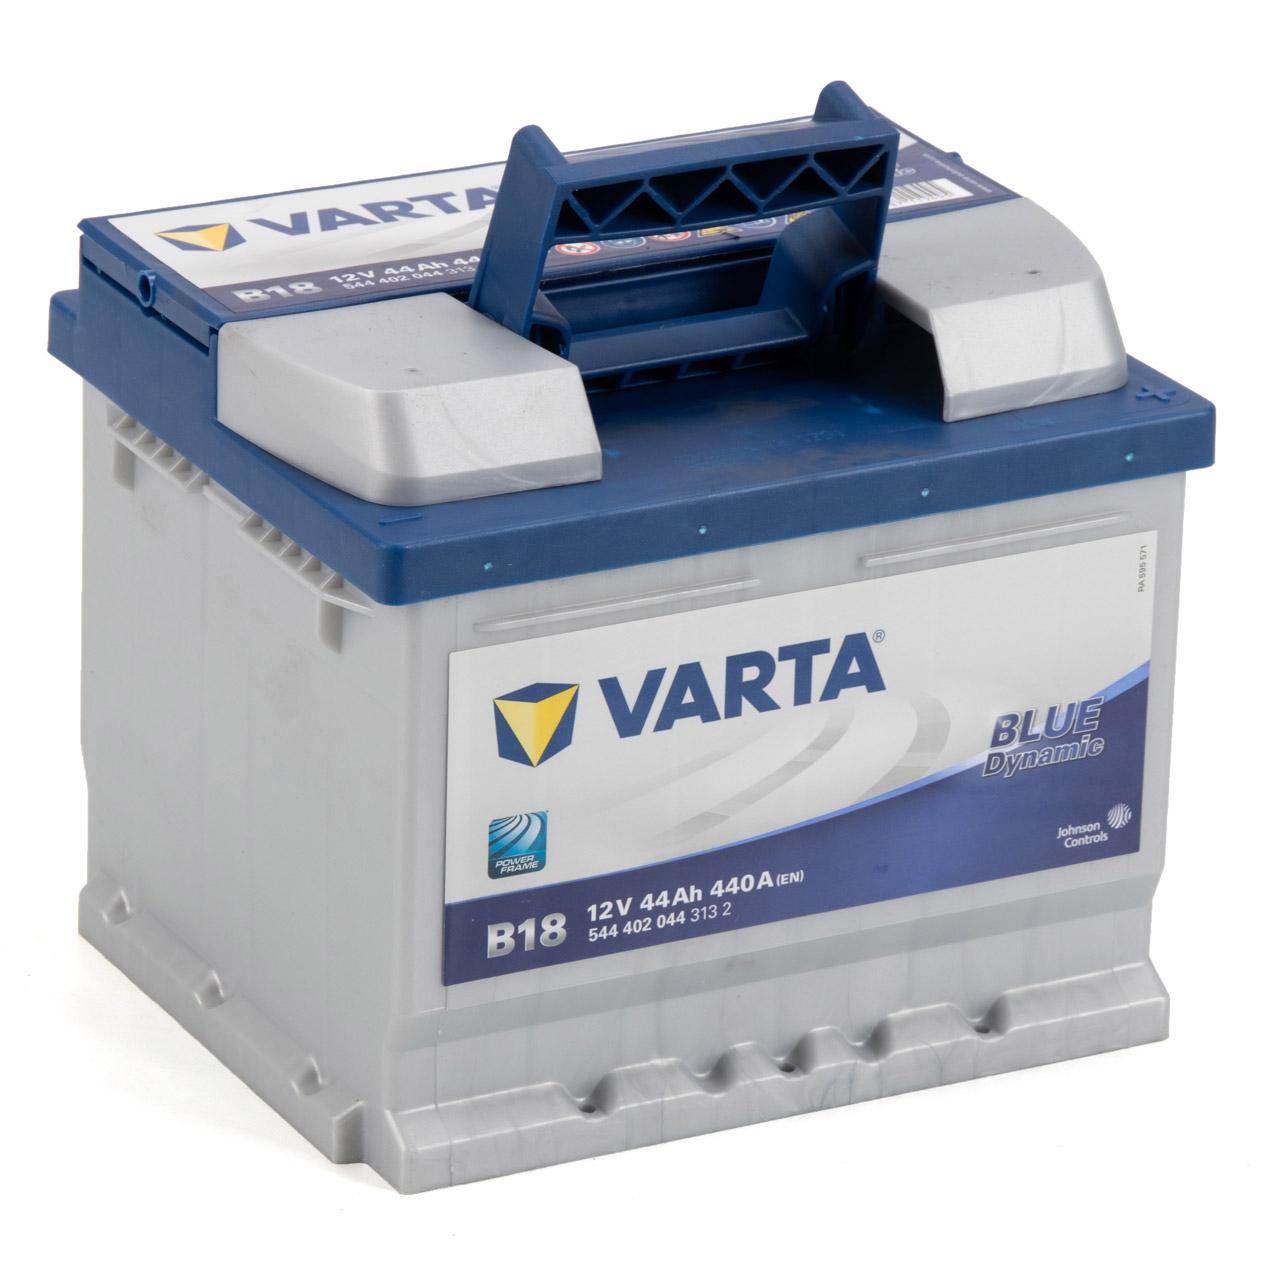 VARTA BLUE dynamic B18 Autobatterie Batterie Starterbatterie 12V 44Ah 440A